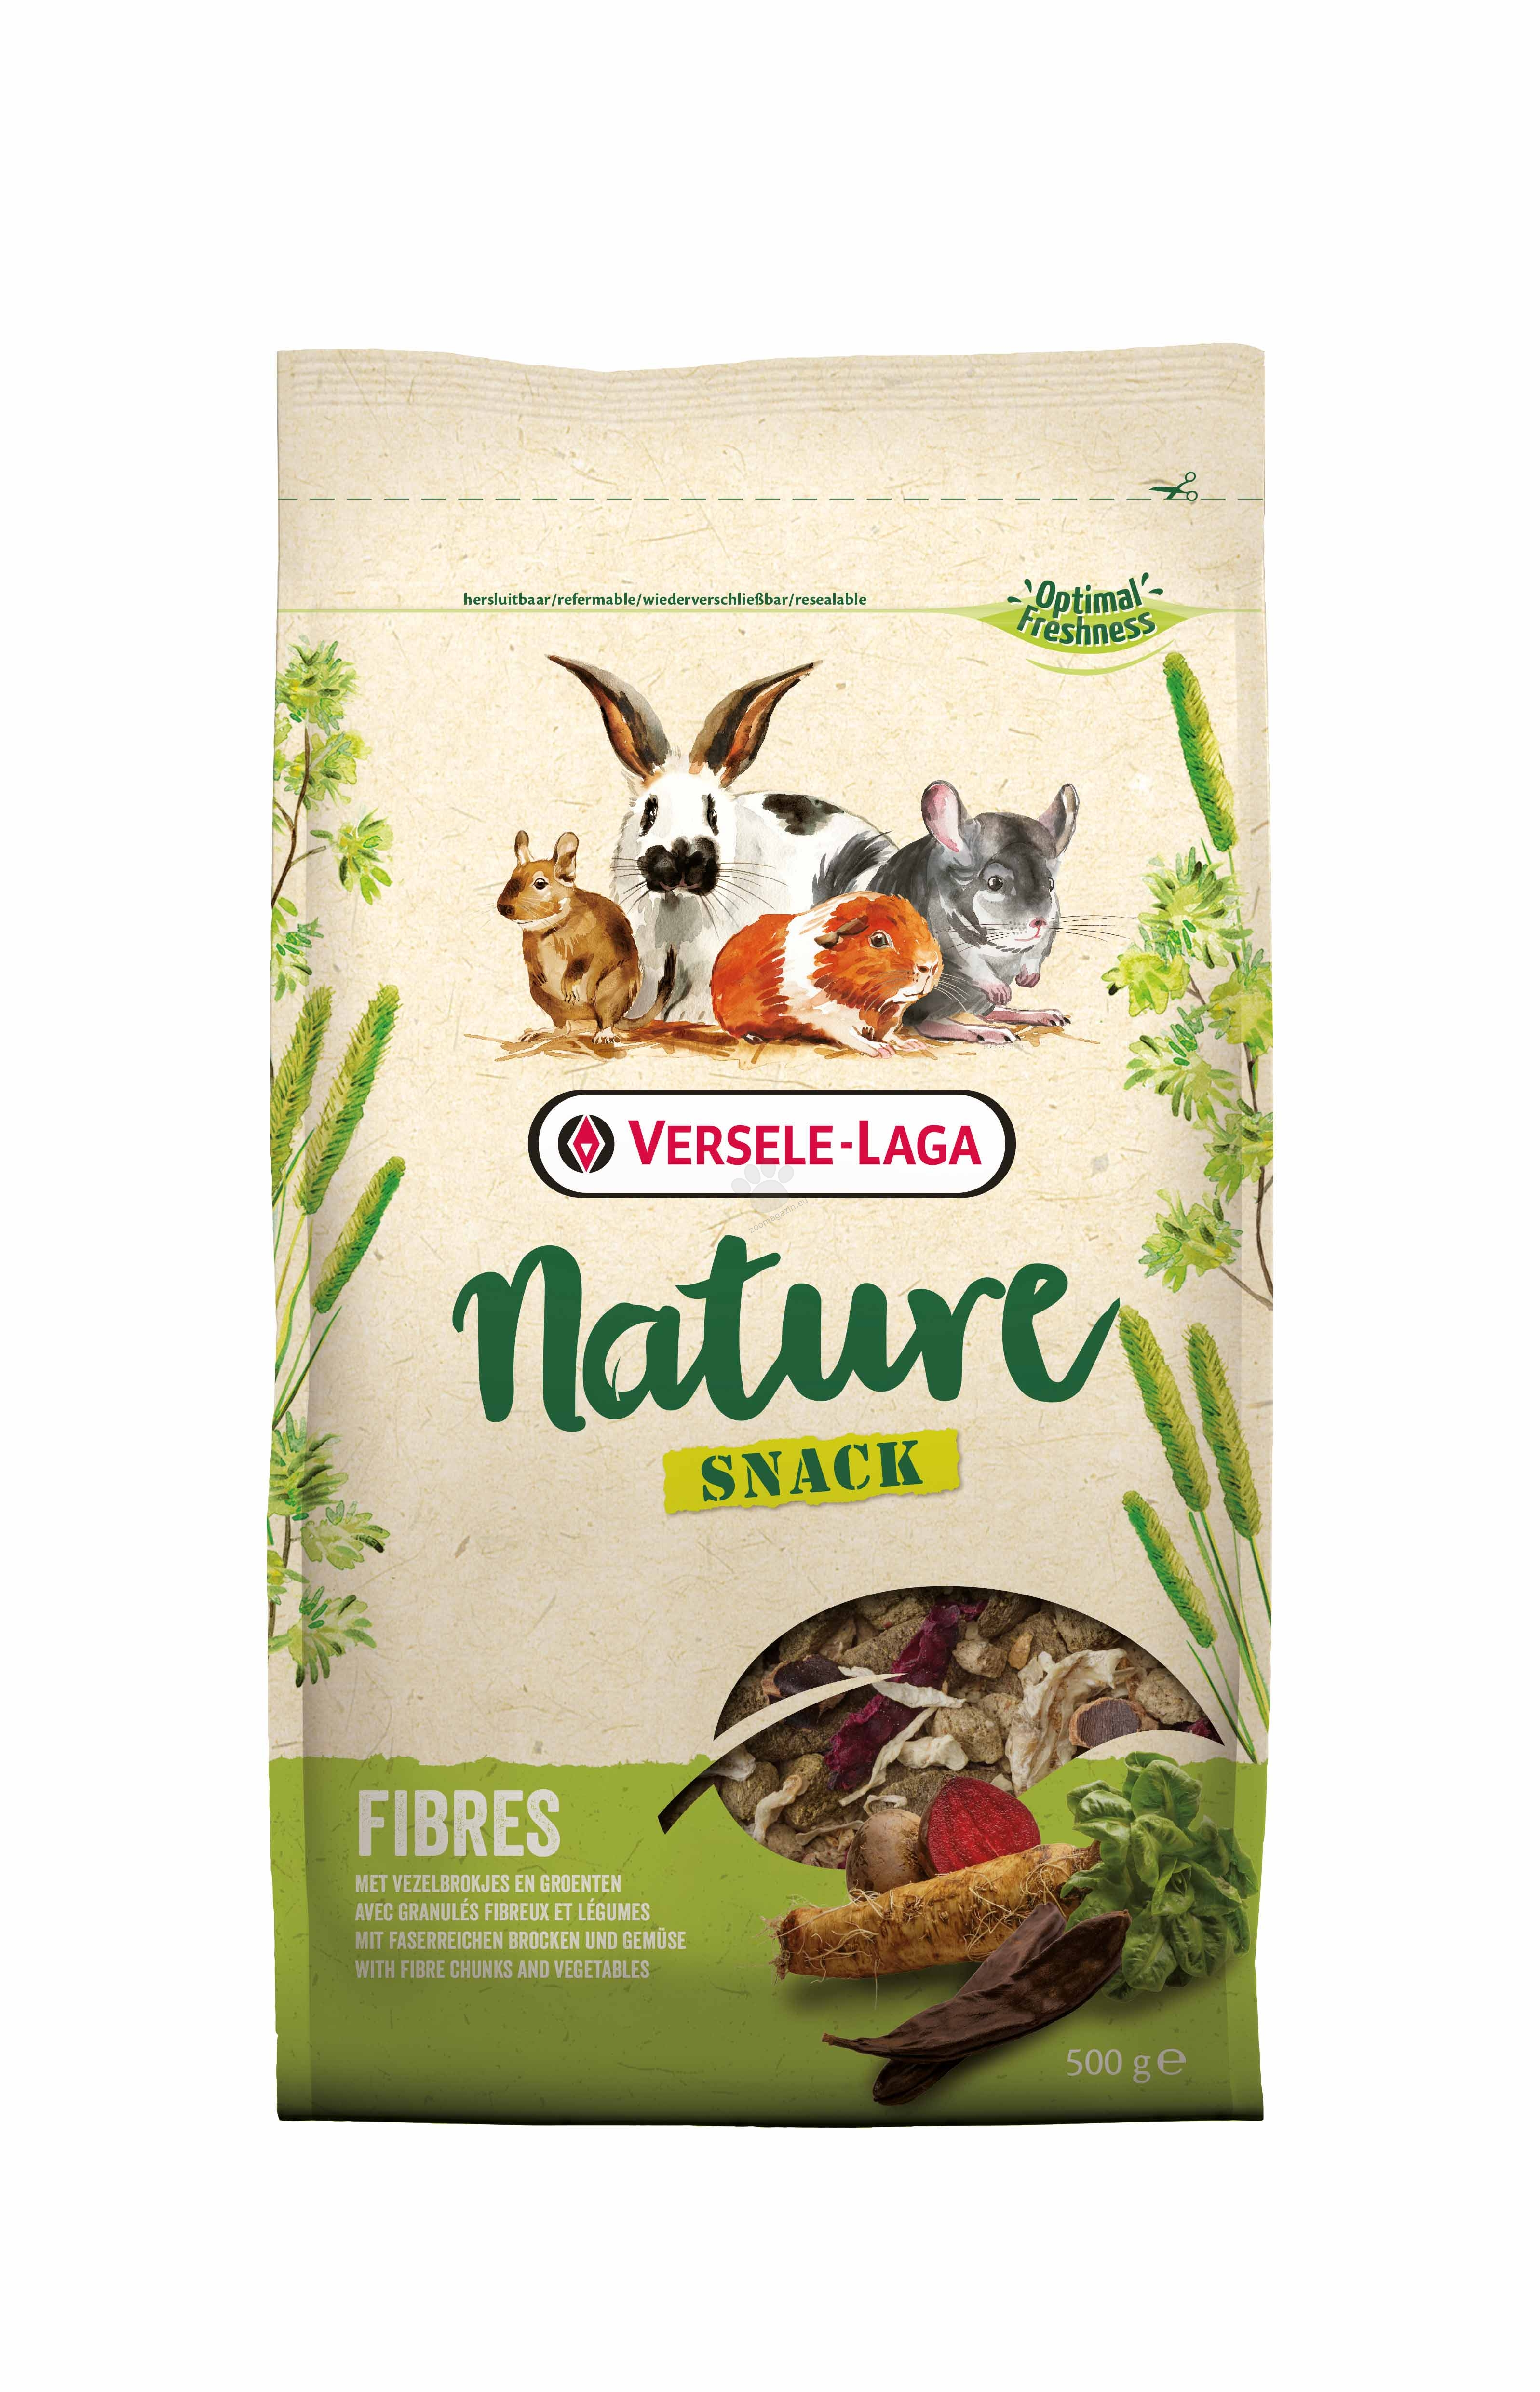 Versele Laga - Nature Snack Cereals - разнообразна закуска от зърнени храни 500 гр.